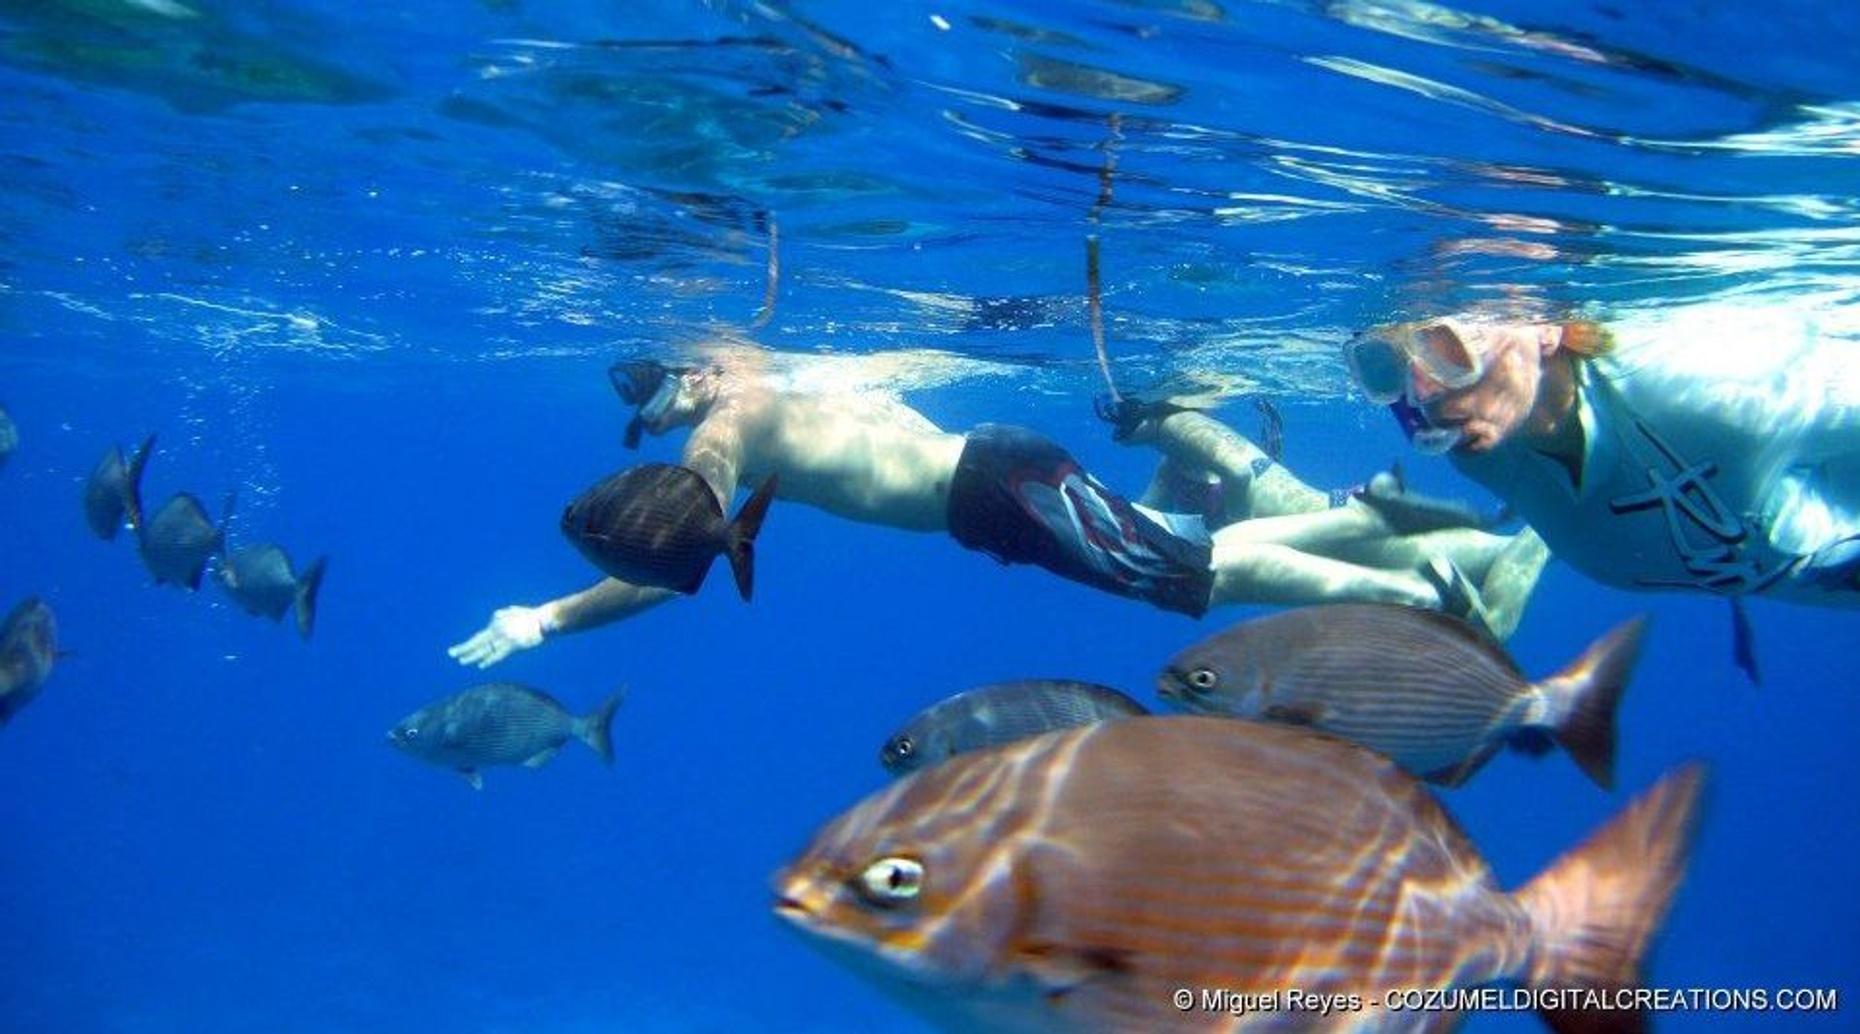 VIP Glass Bottom Boat & Snorkeling Adventure in Cozumel